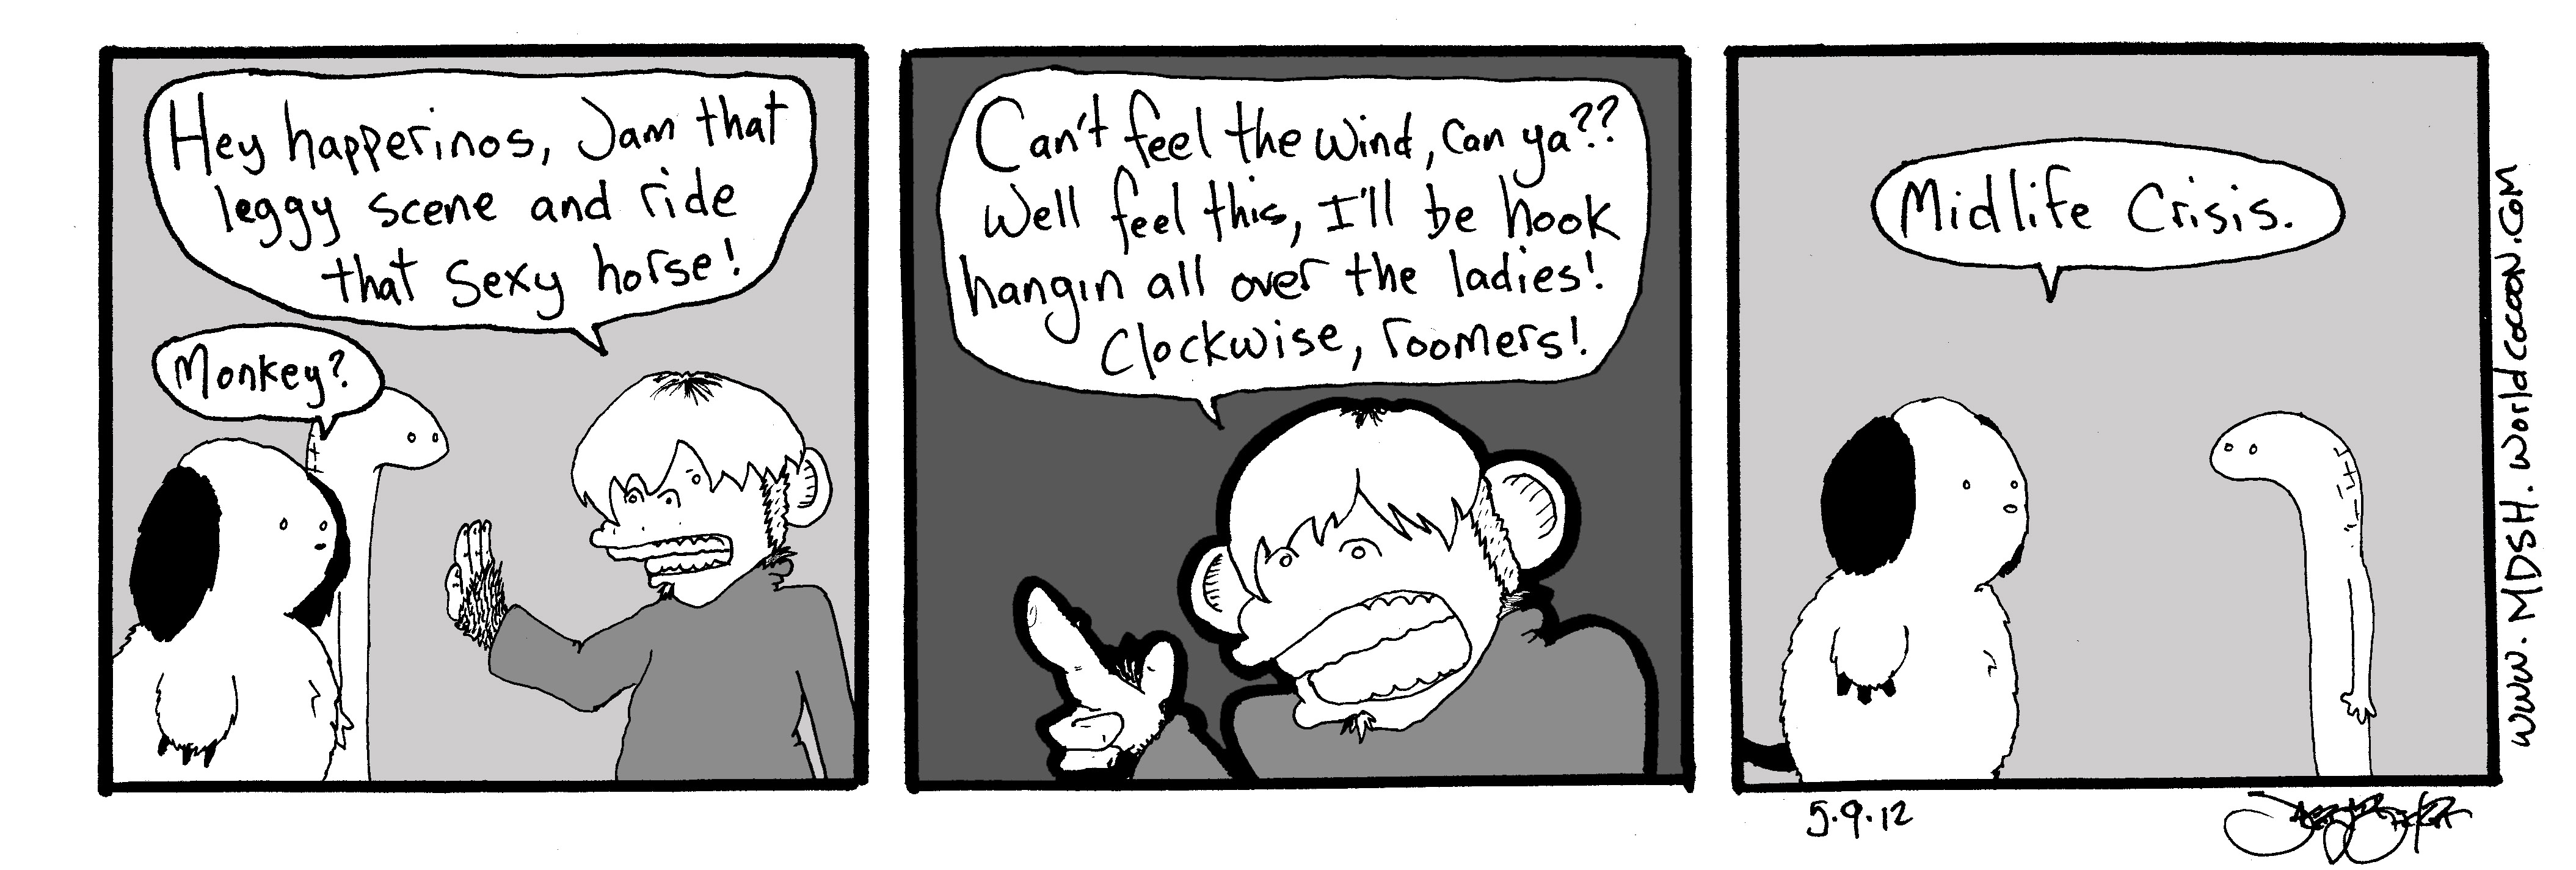 05/09/2012